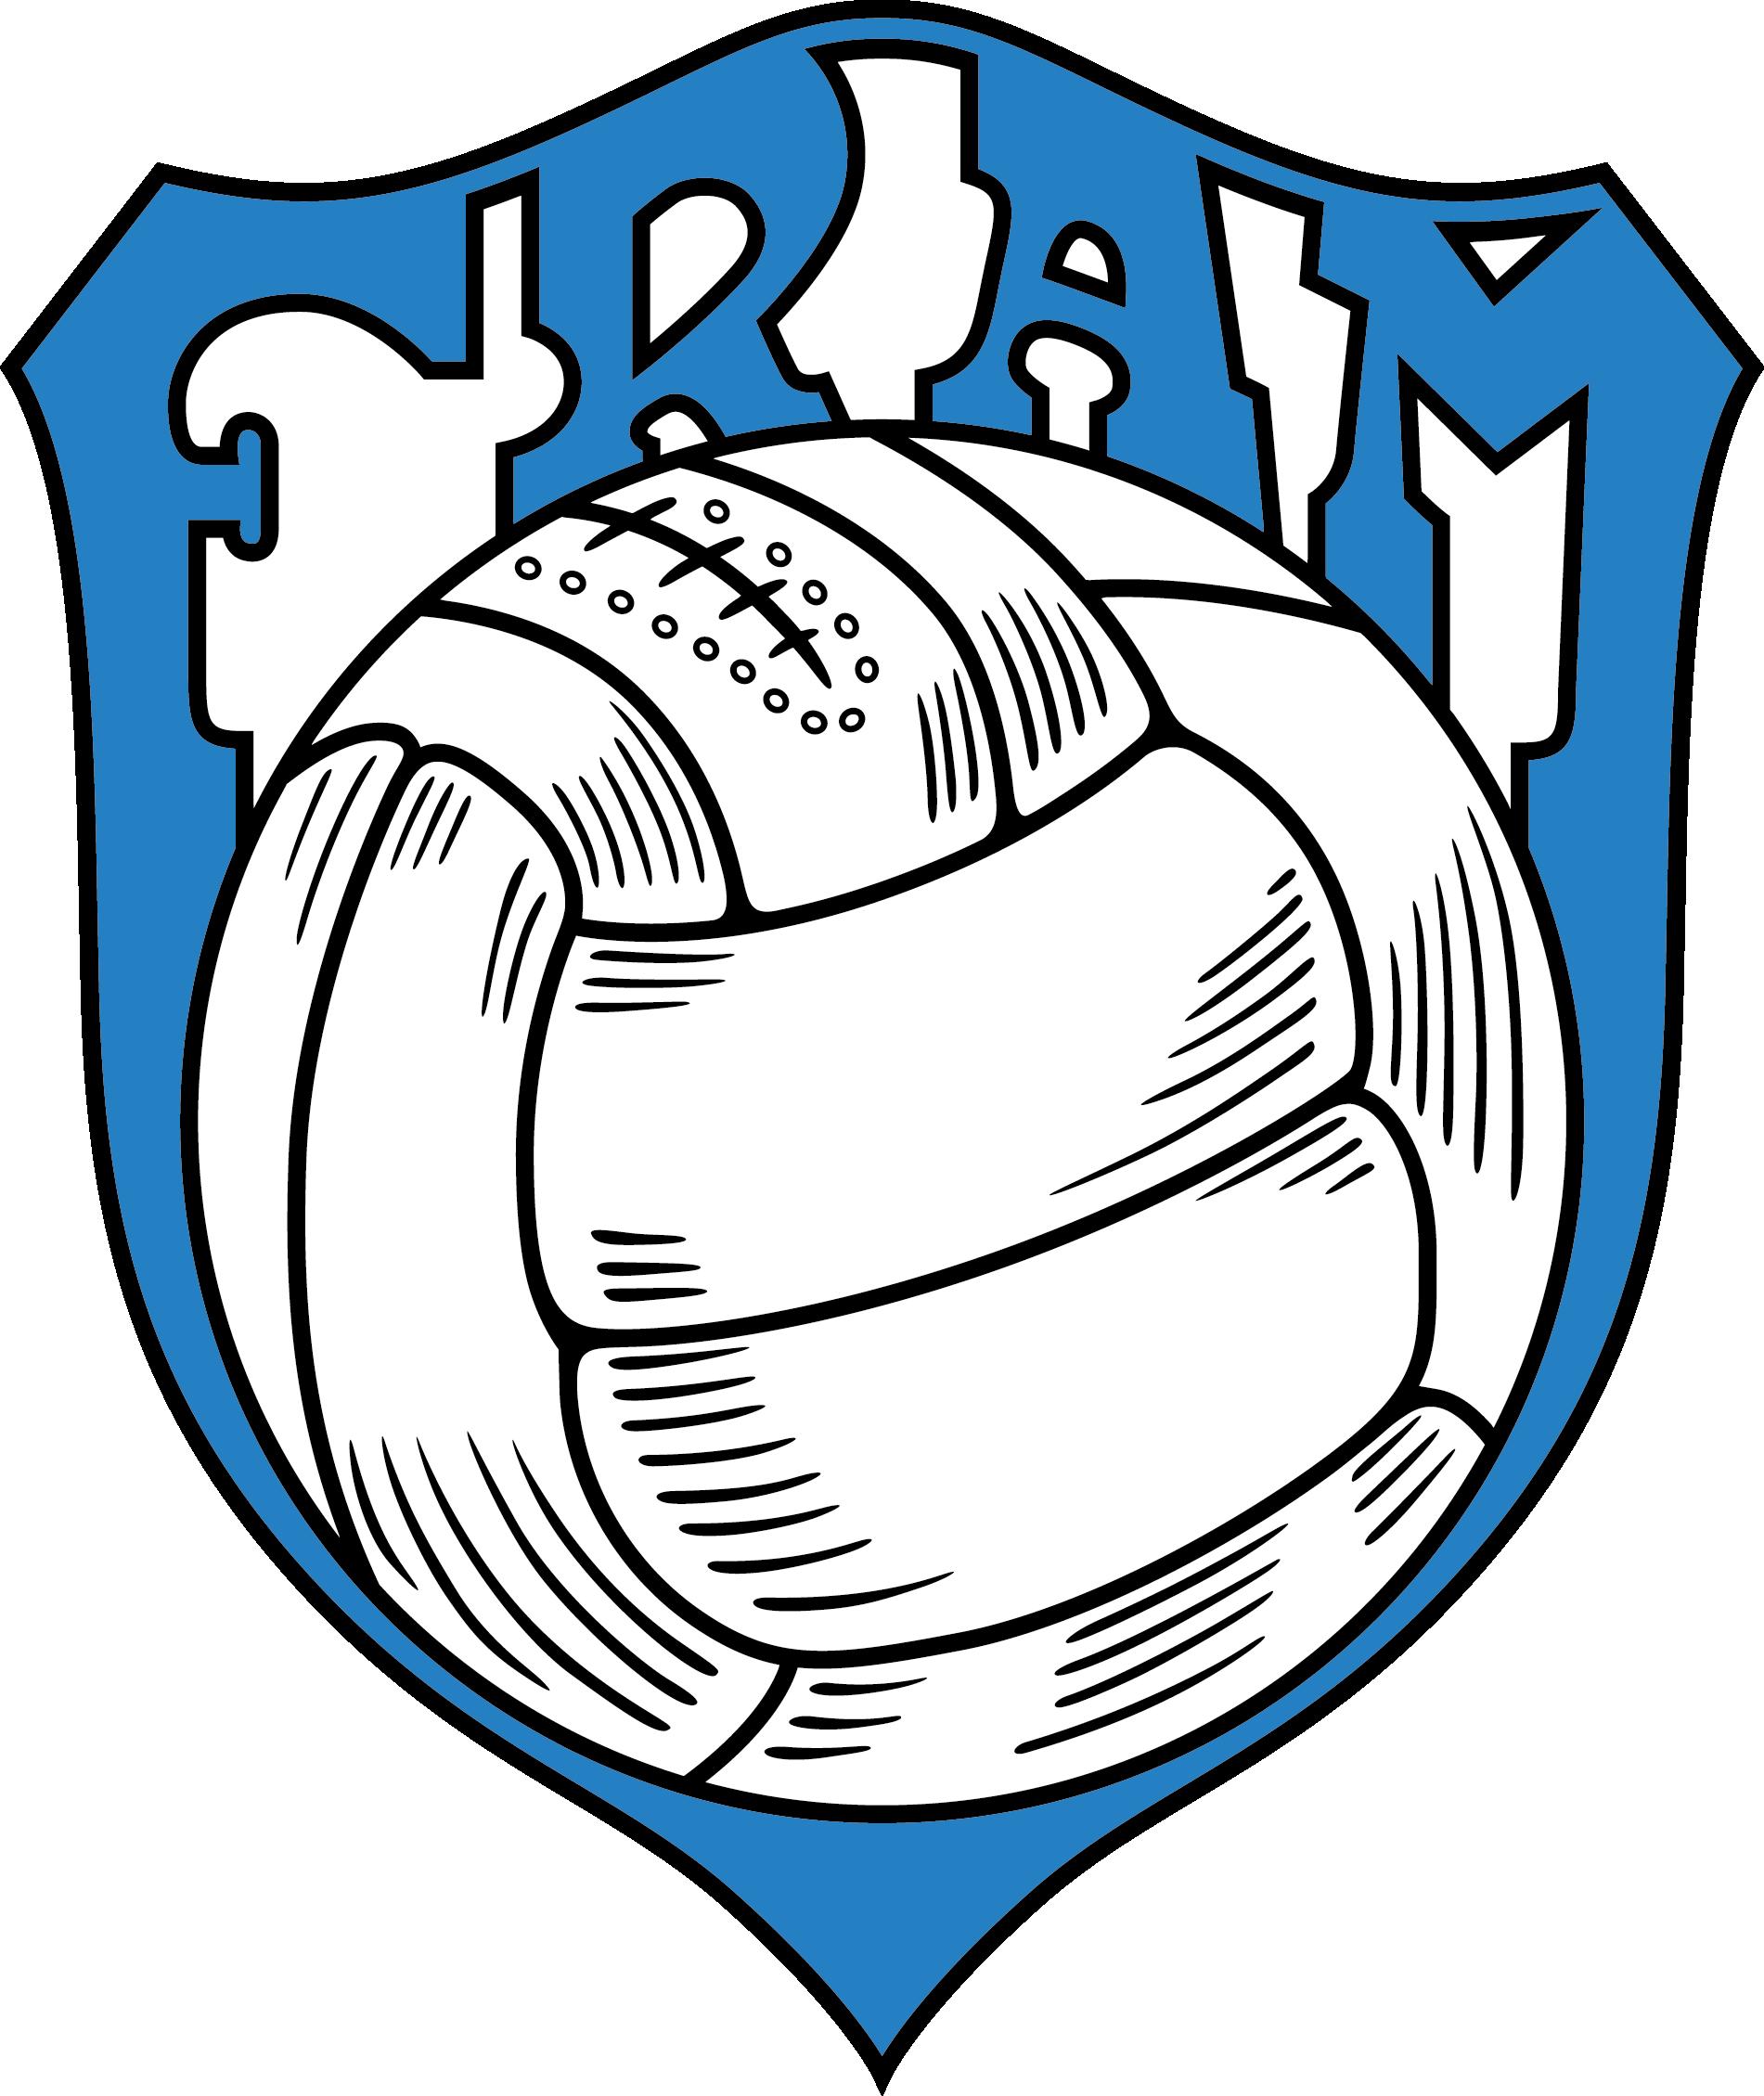 Baseball underline clipart black and white picture royalty free library Fram Reykjavik | Football Logo | Pinterest picture royalty free library